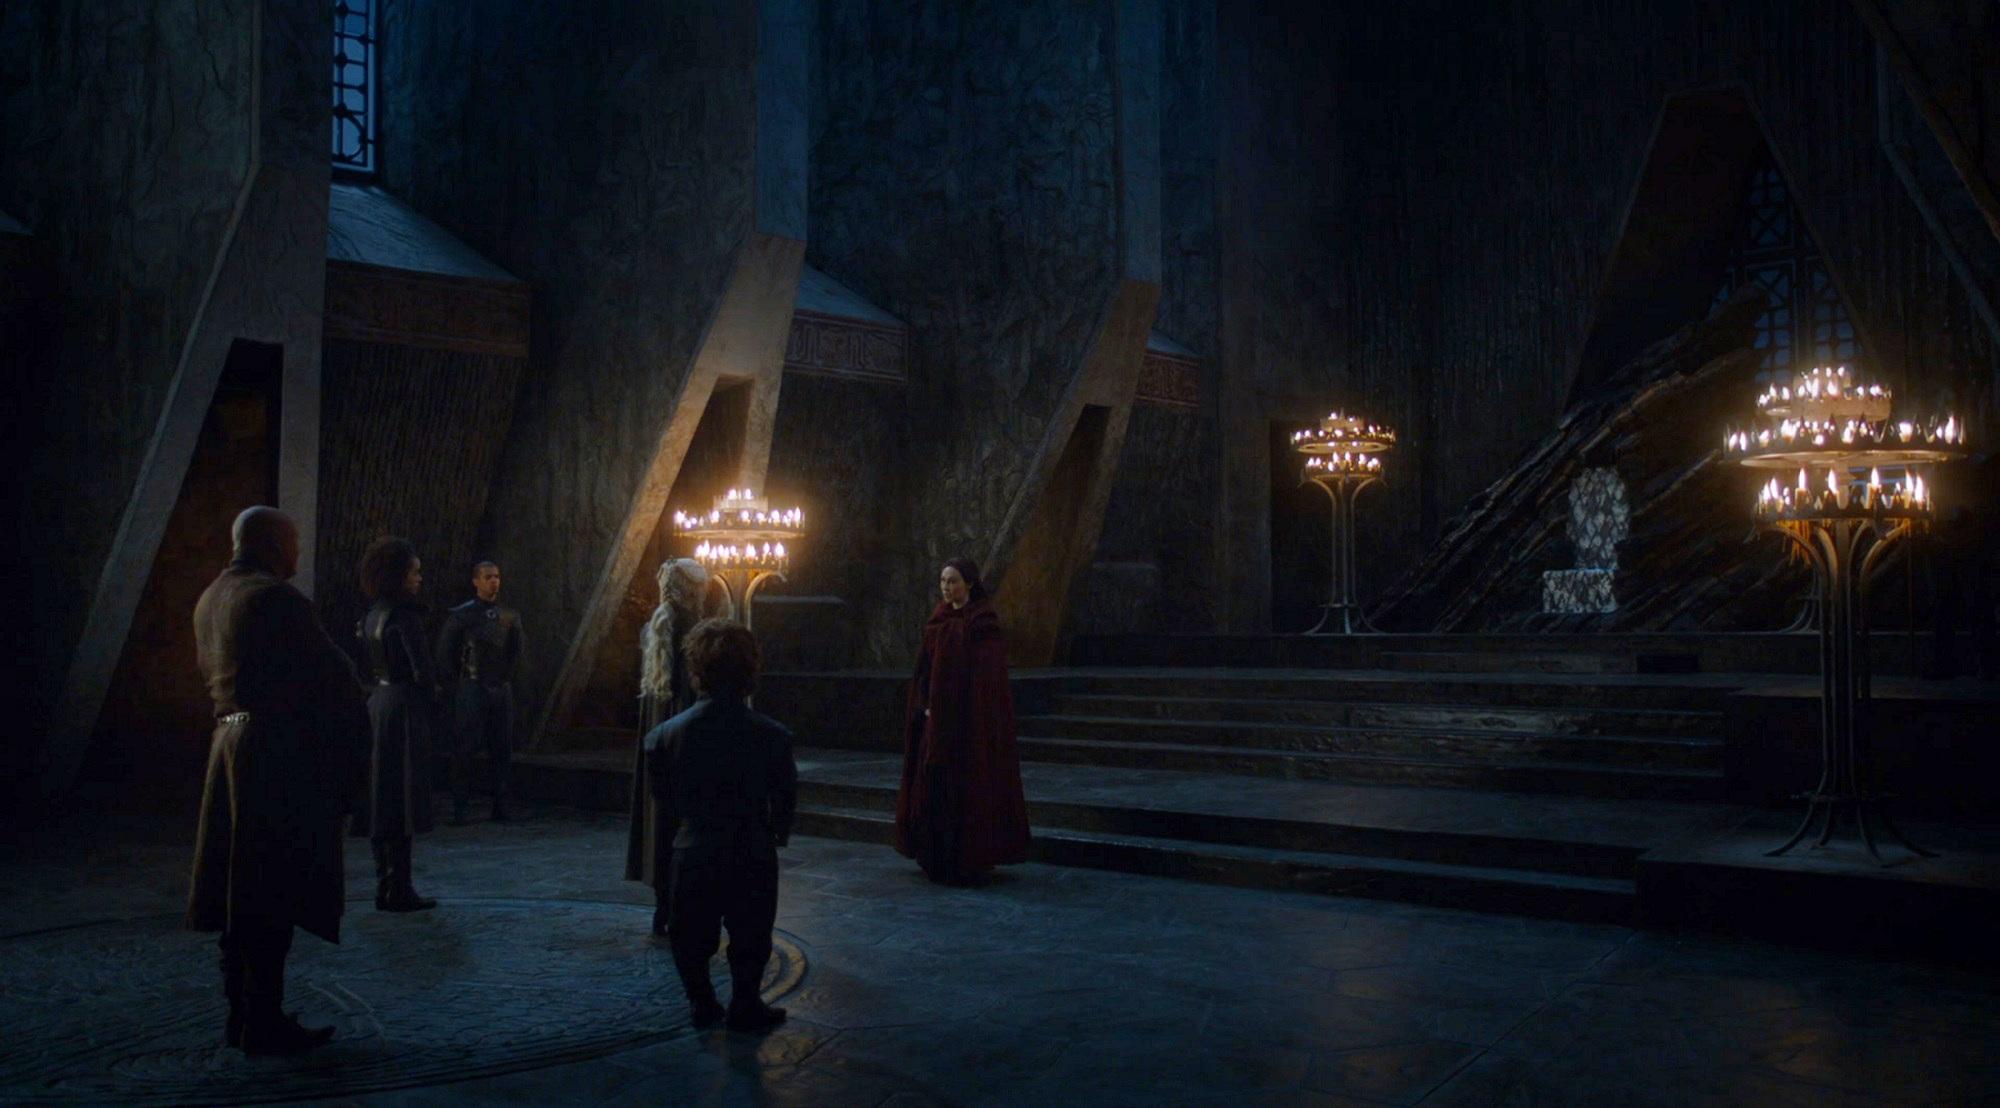 Daenerys and Melisandre